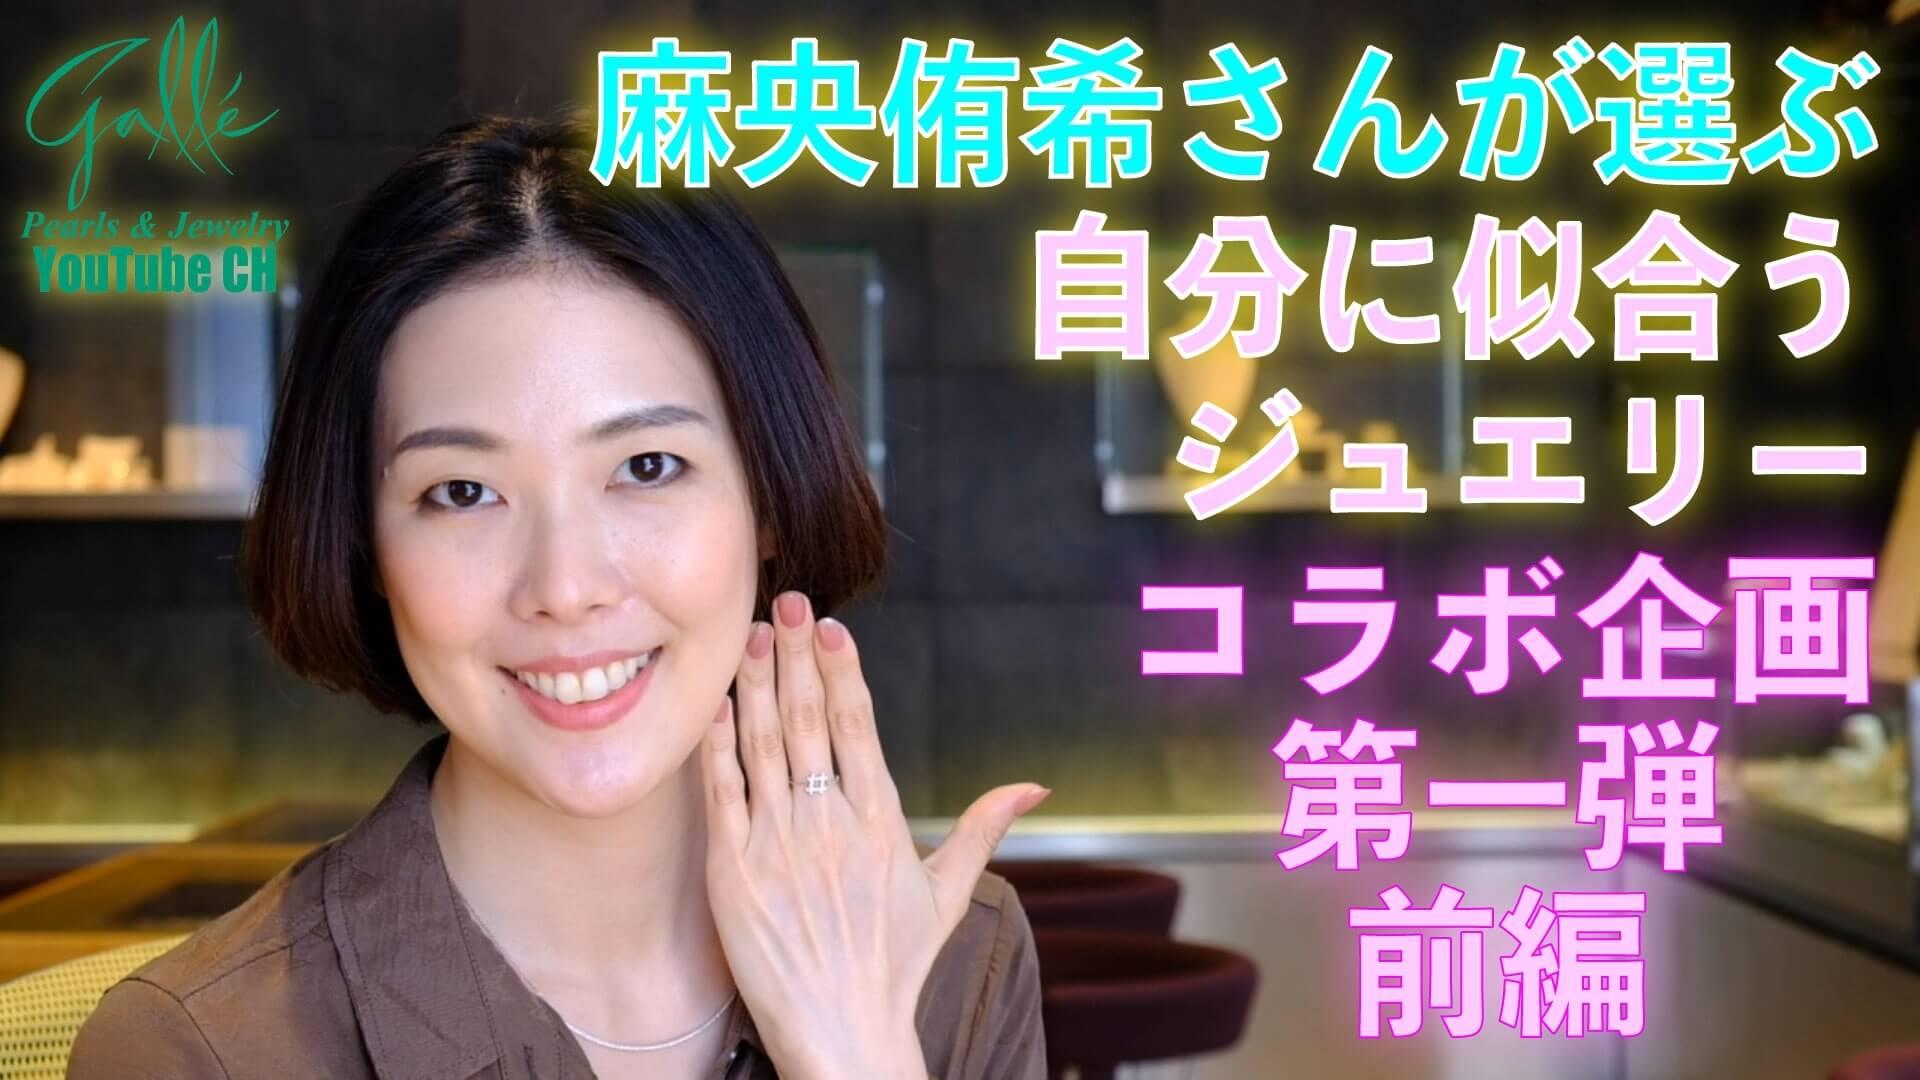 Galle × 麻央 侑希コラボ企画第一弾前編のサムネイル